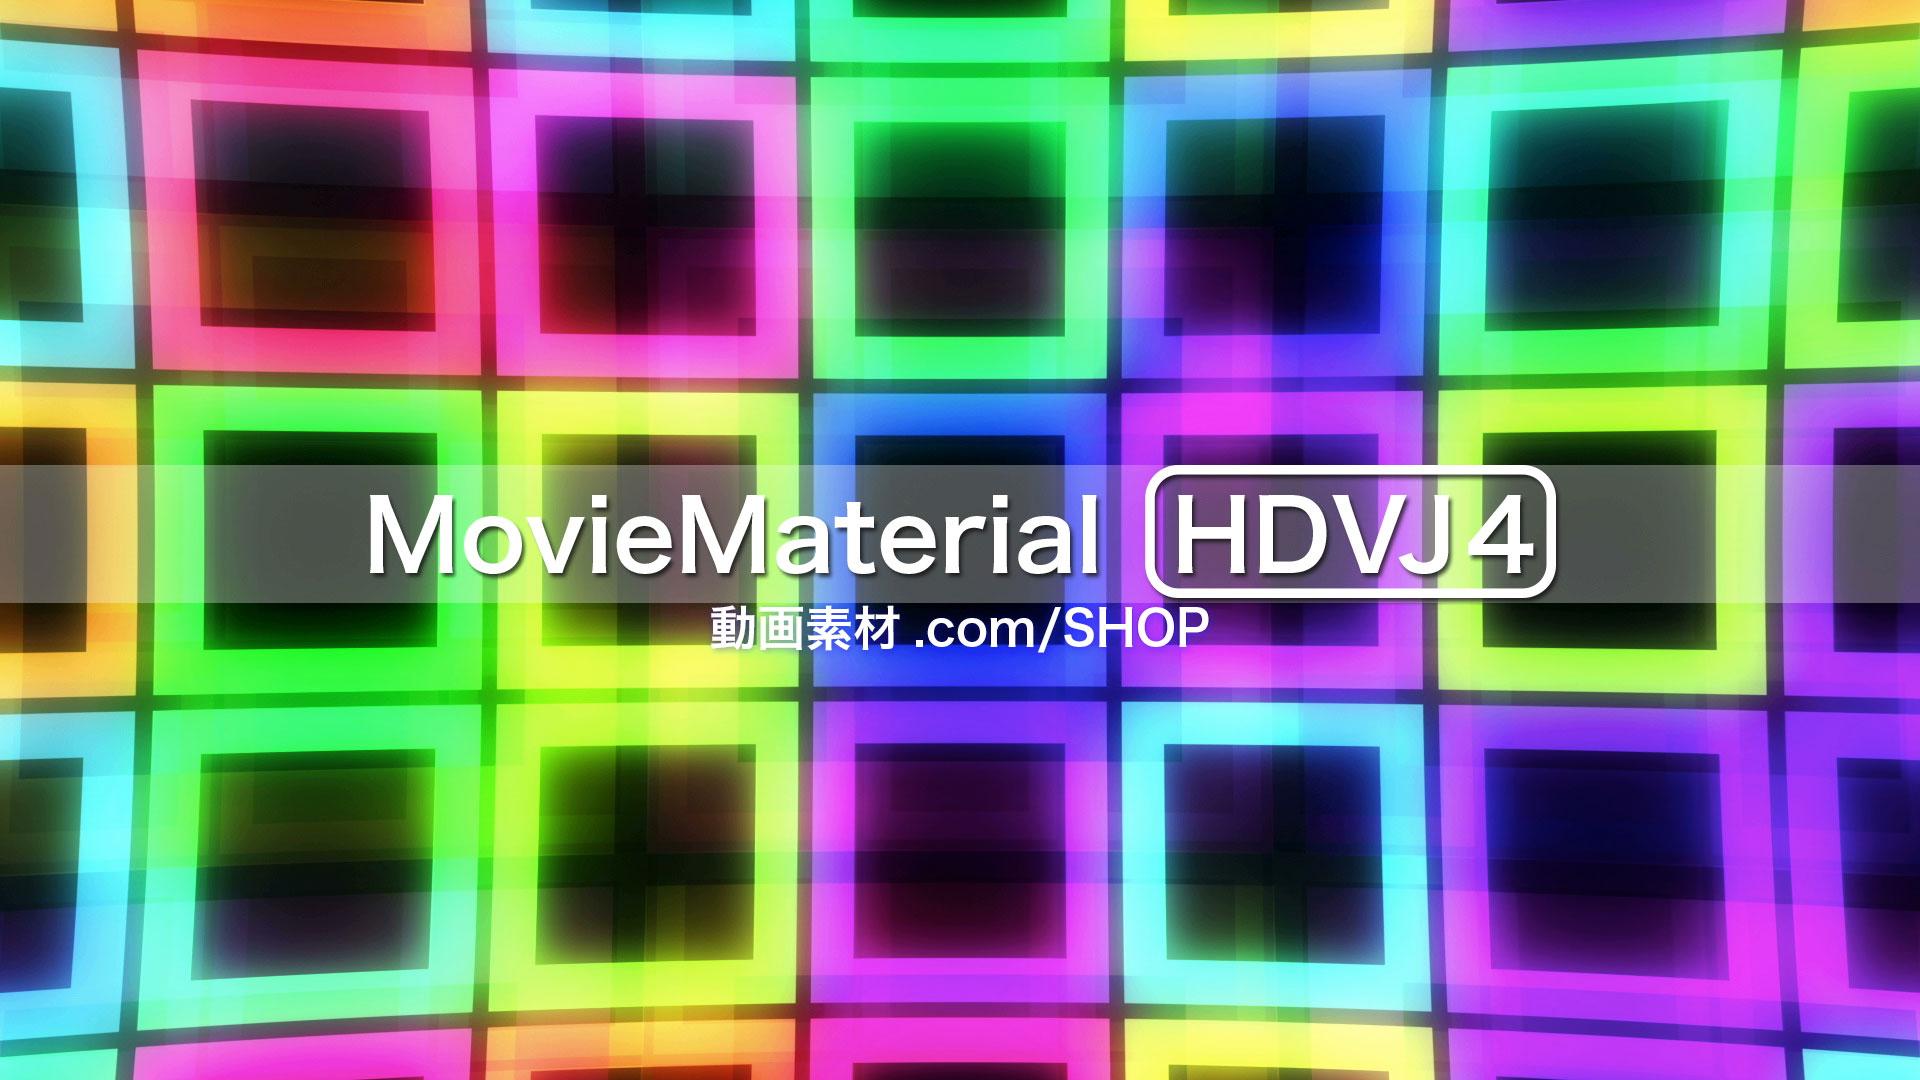 MovieMaterial HDVJ4 フルハイビジョンVJ動画素材集 画像8